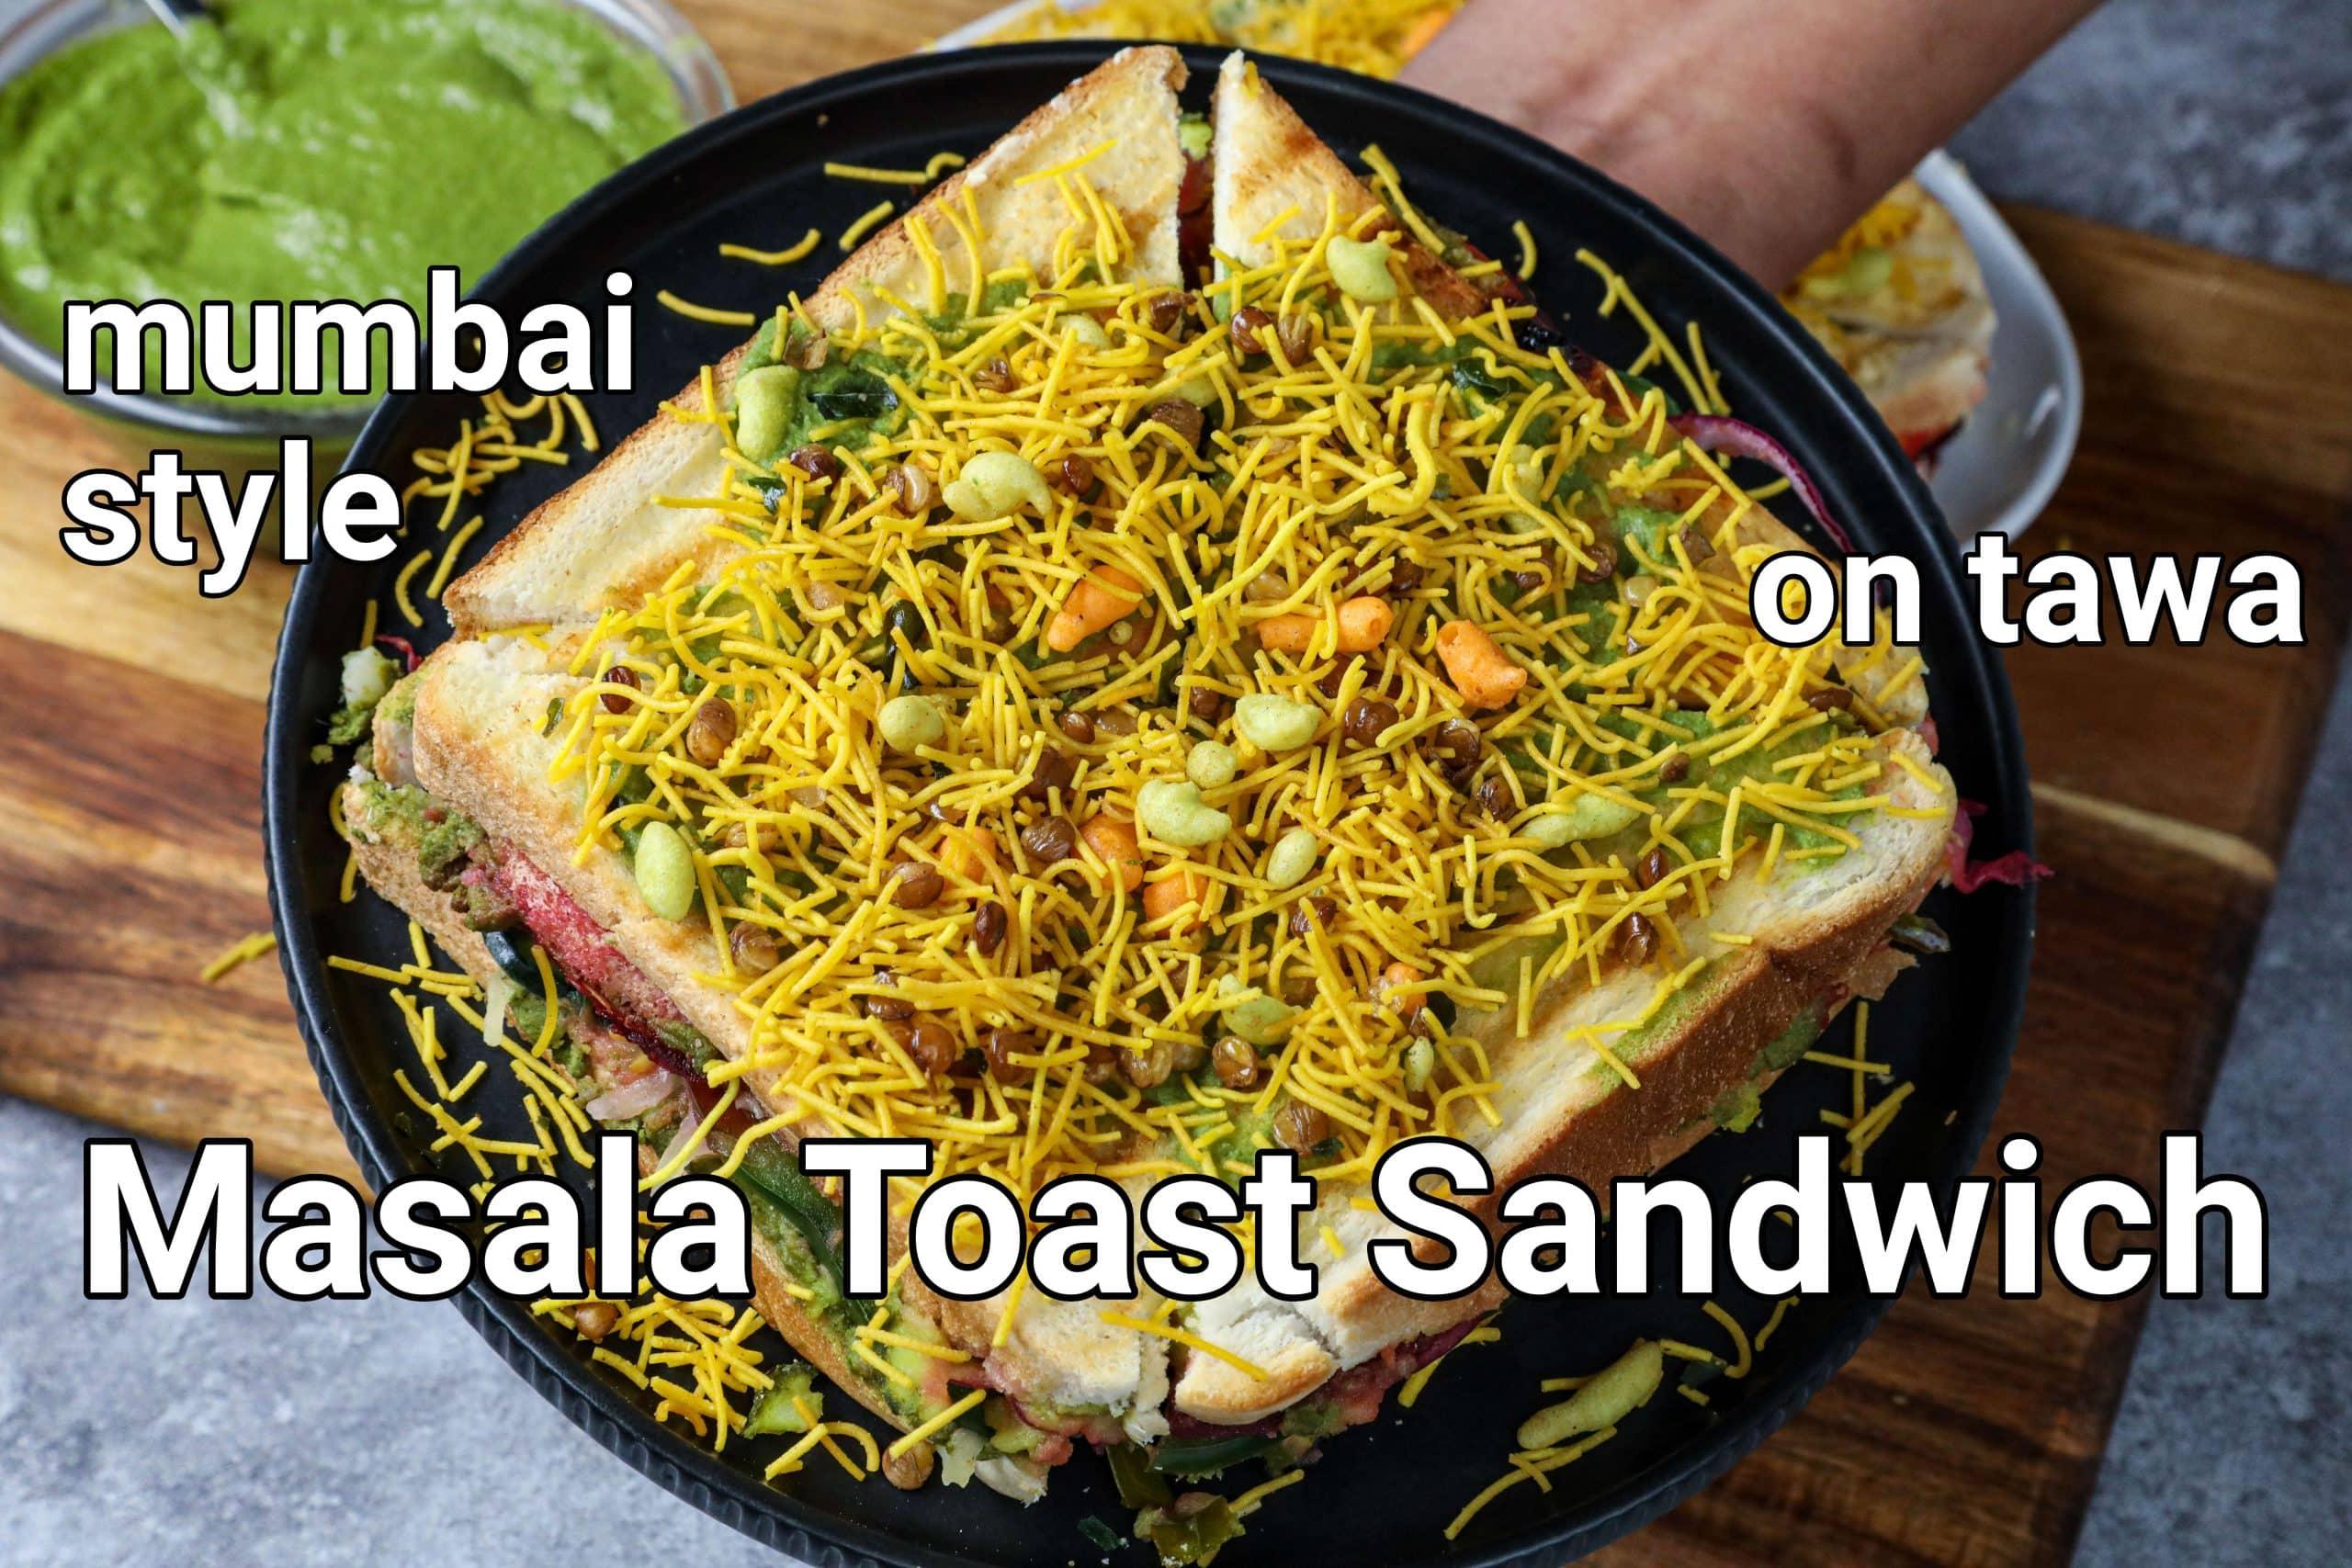 masala sandwich recipe | mumbai masala toast sandwich